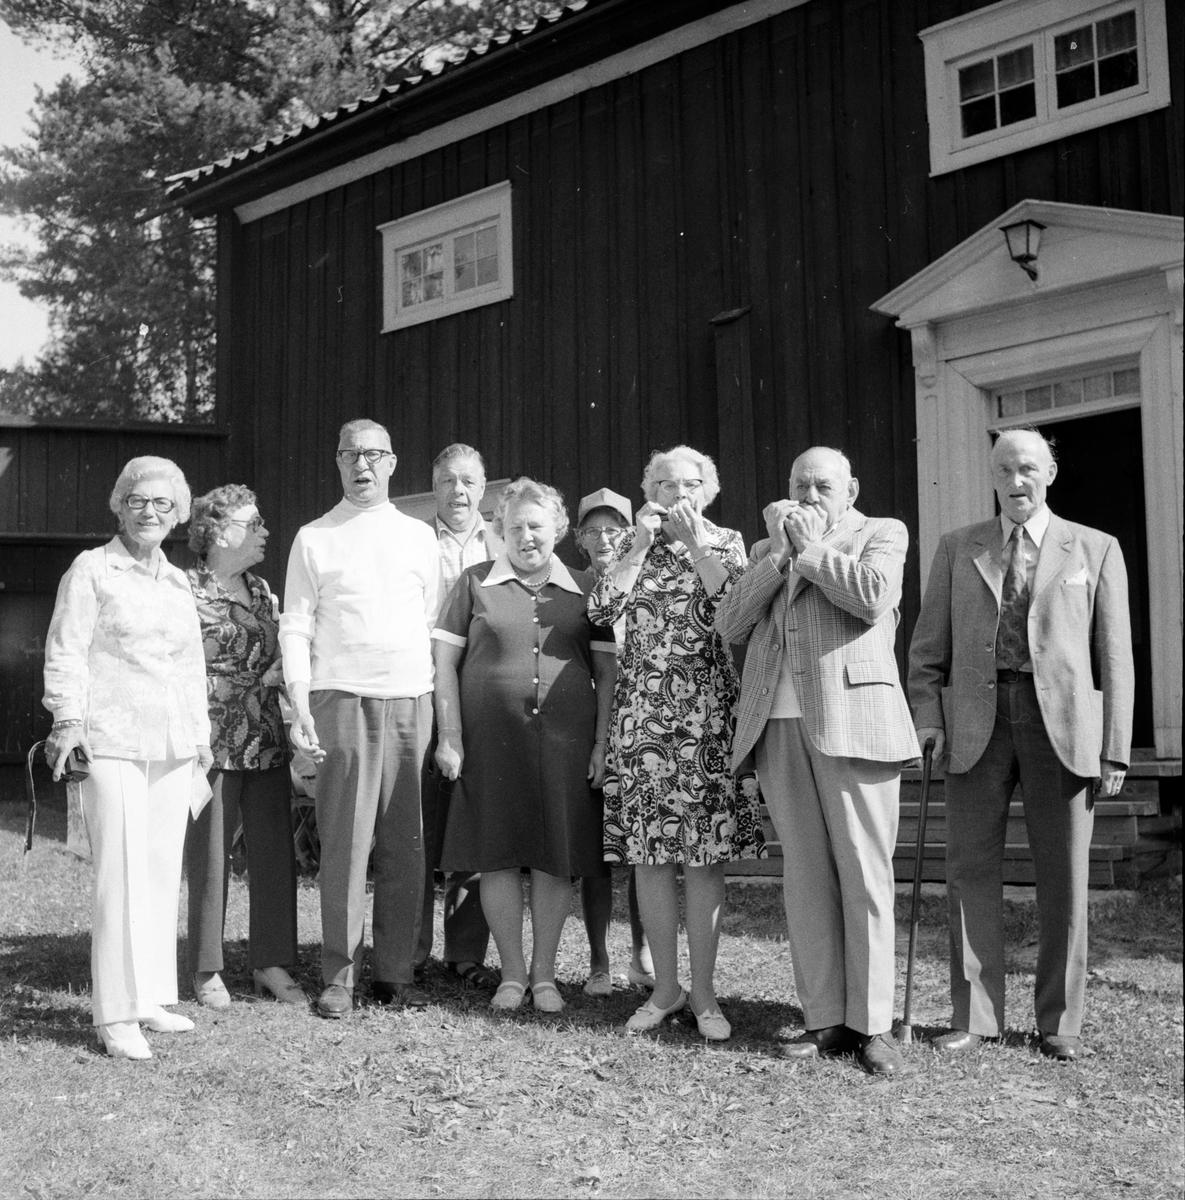 Fornhemmet, Bussresenärer, Gösta Gigg, Augusti 1973